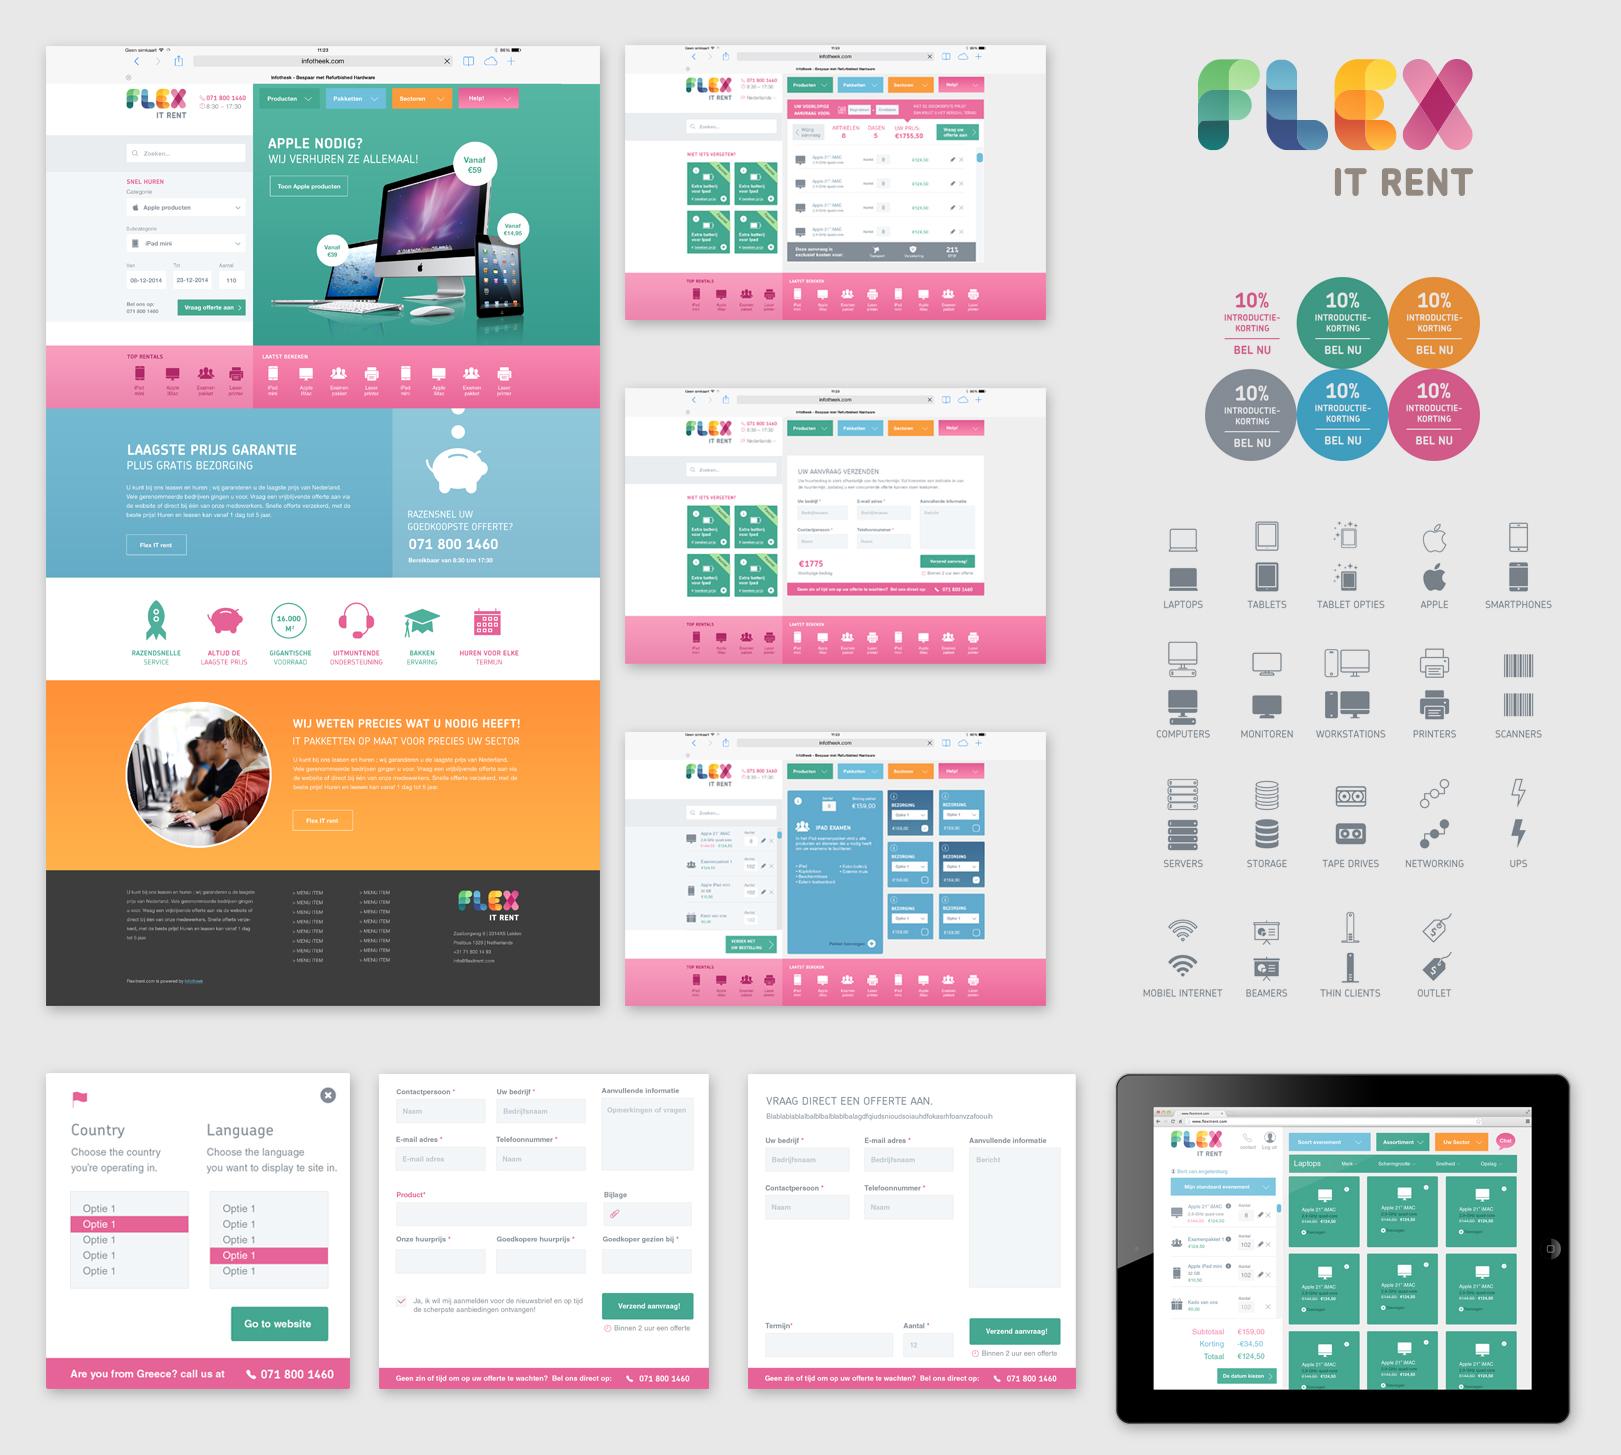 Flexitrent_design